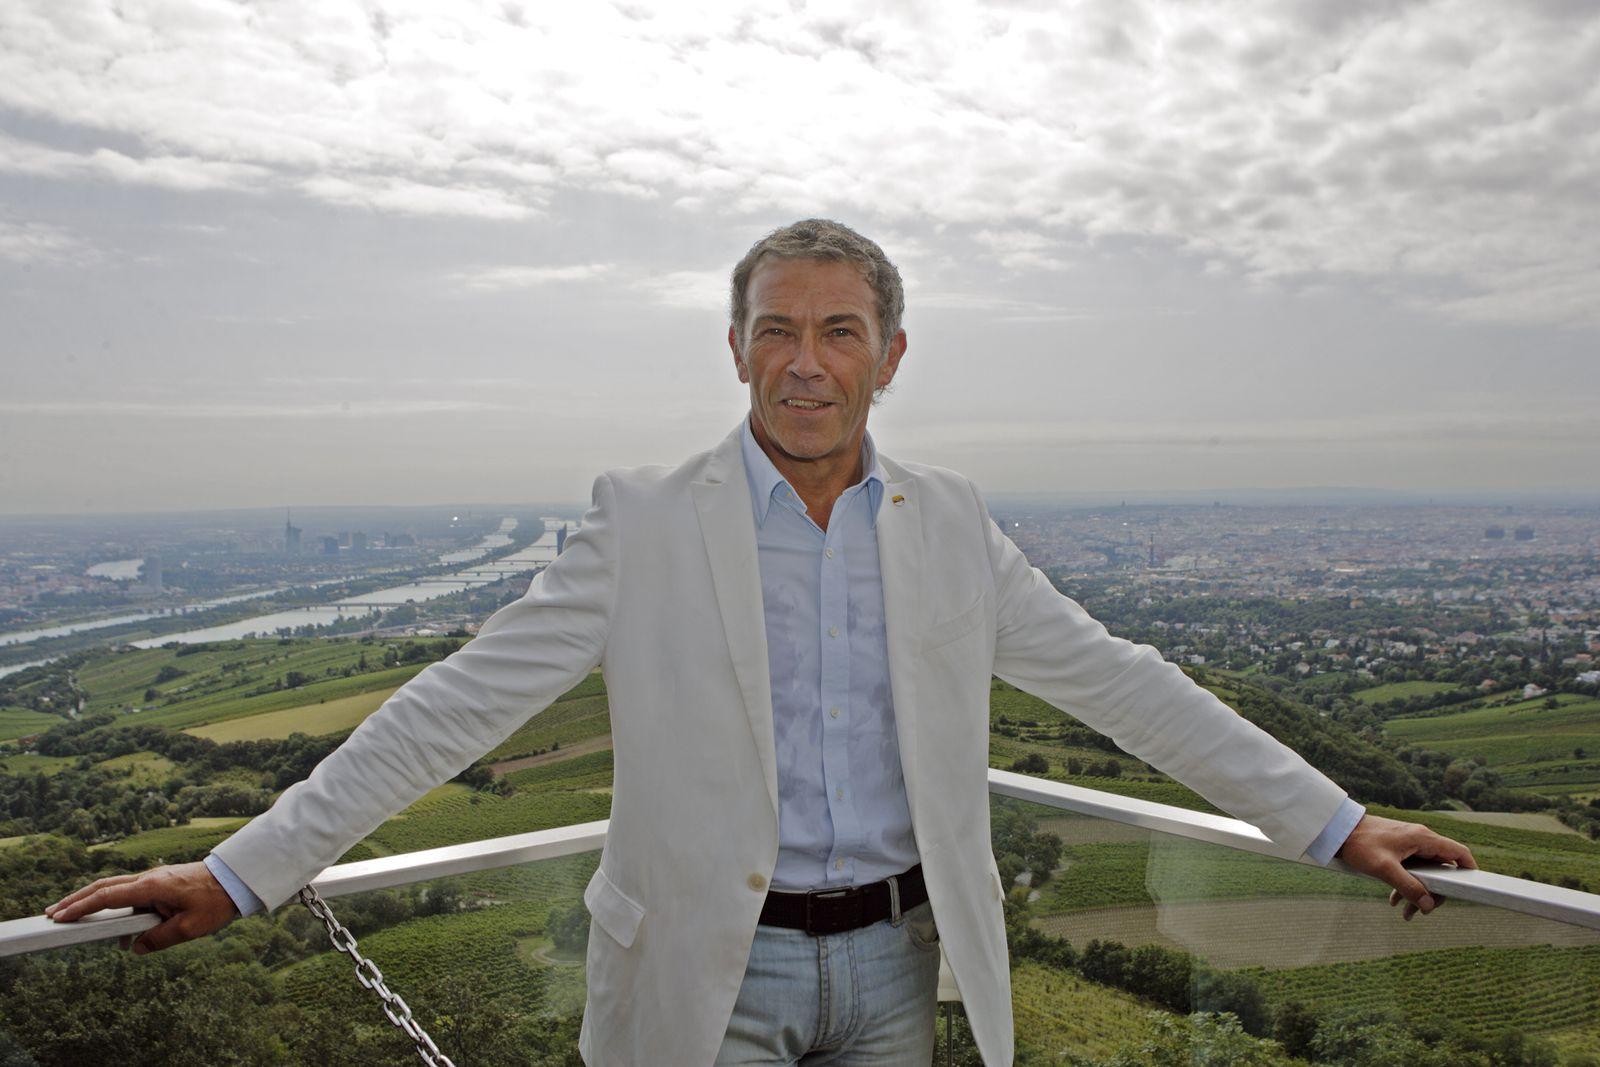 Jörg Haider